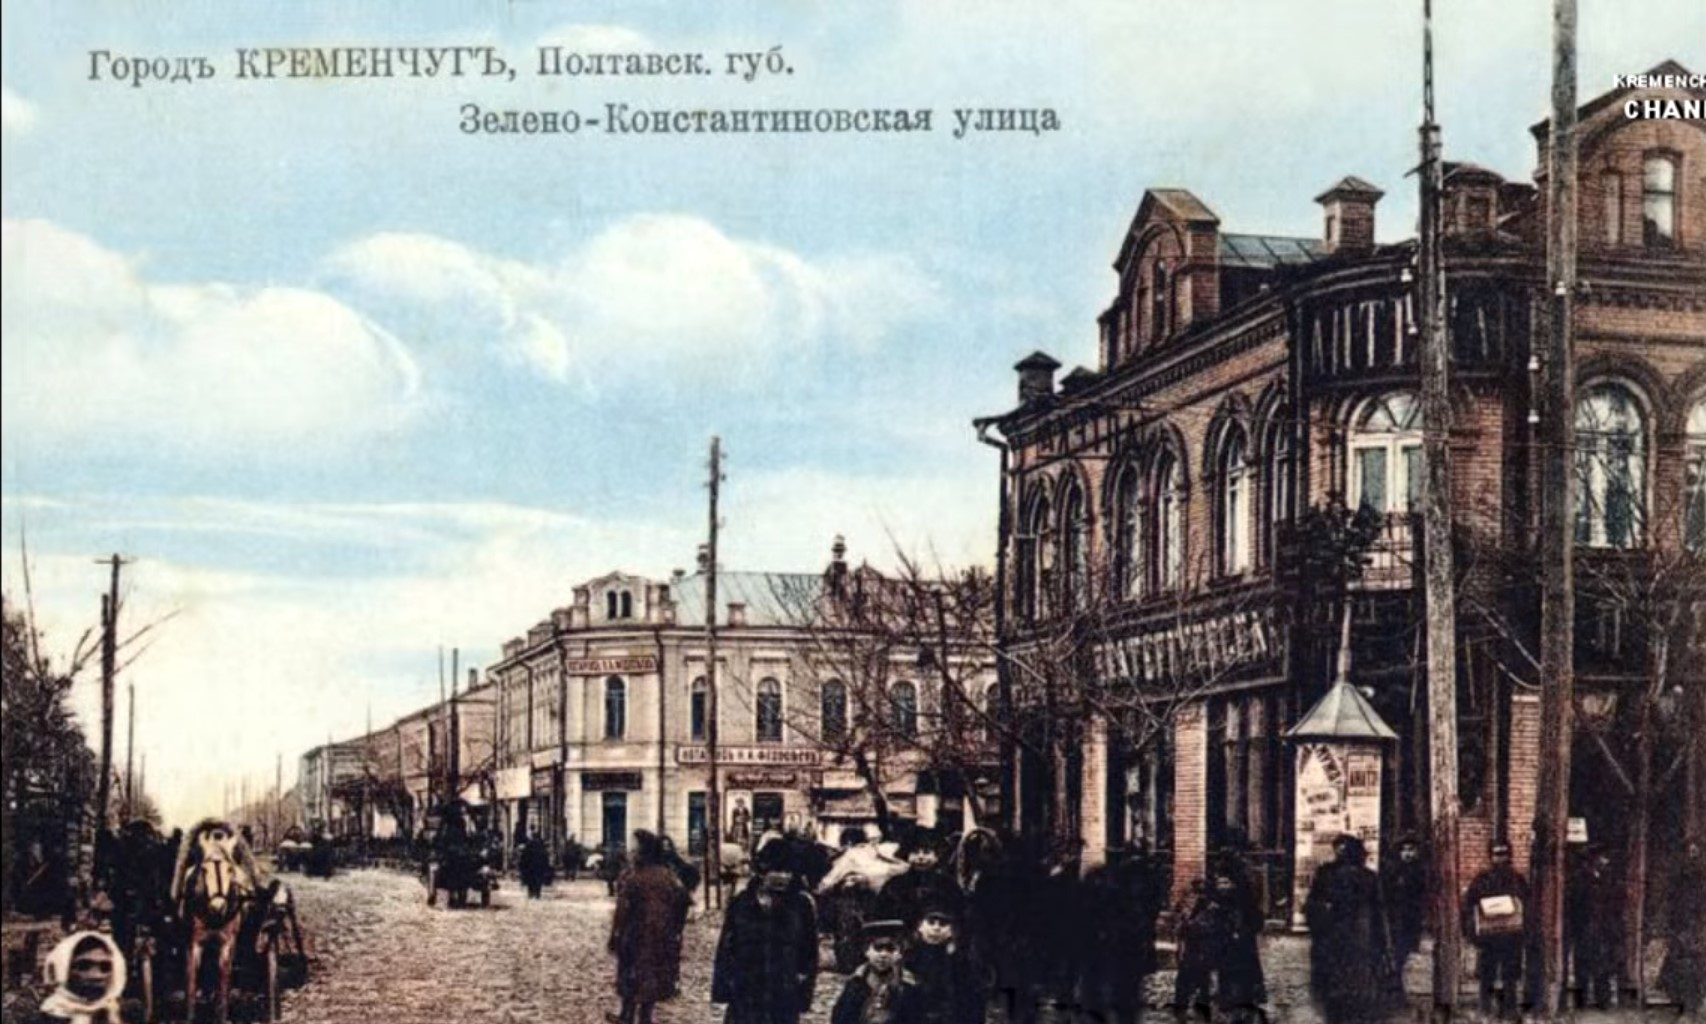 Зелено-Константиновская улица